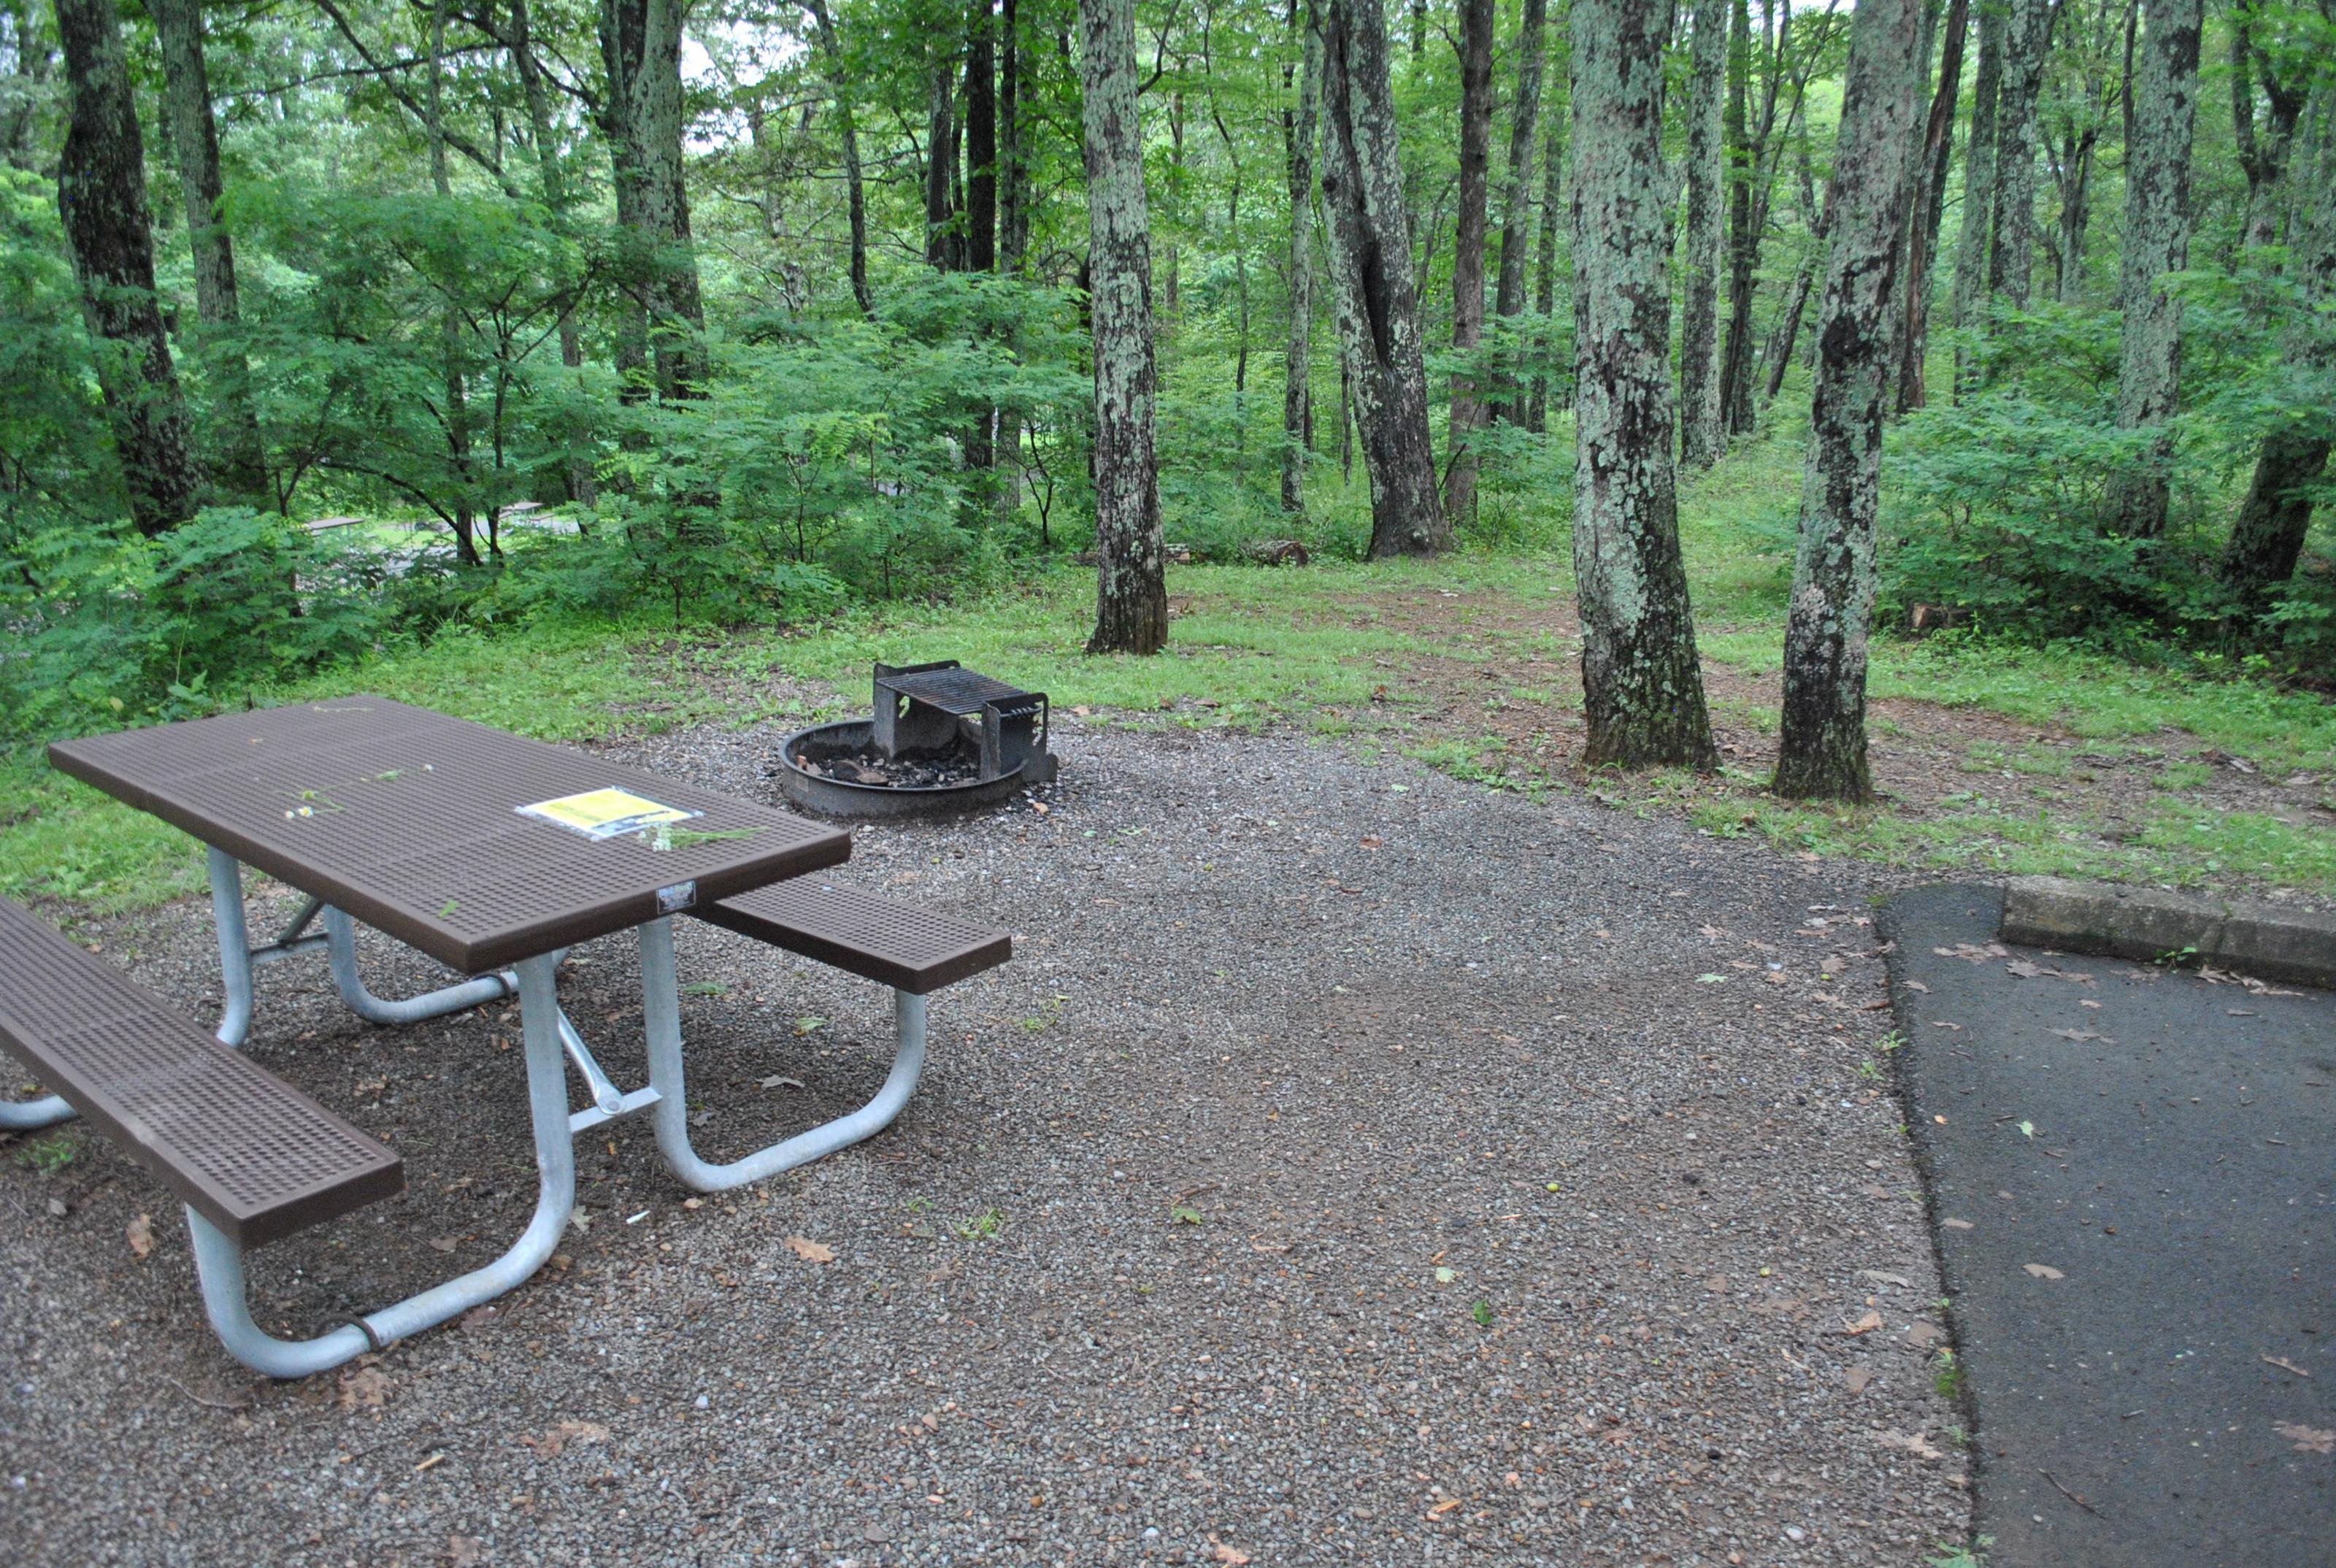 Mathews Arm Campground – Site A026